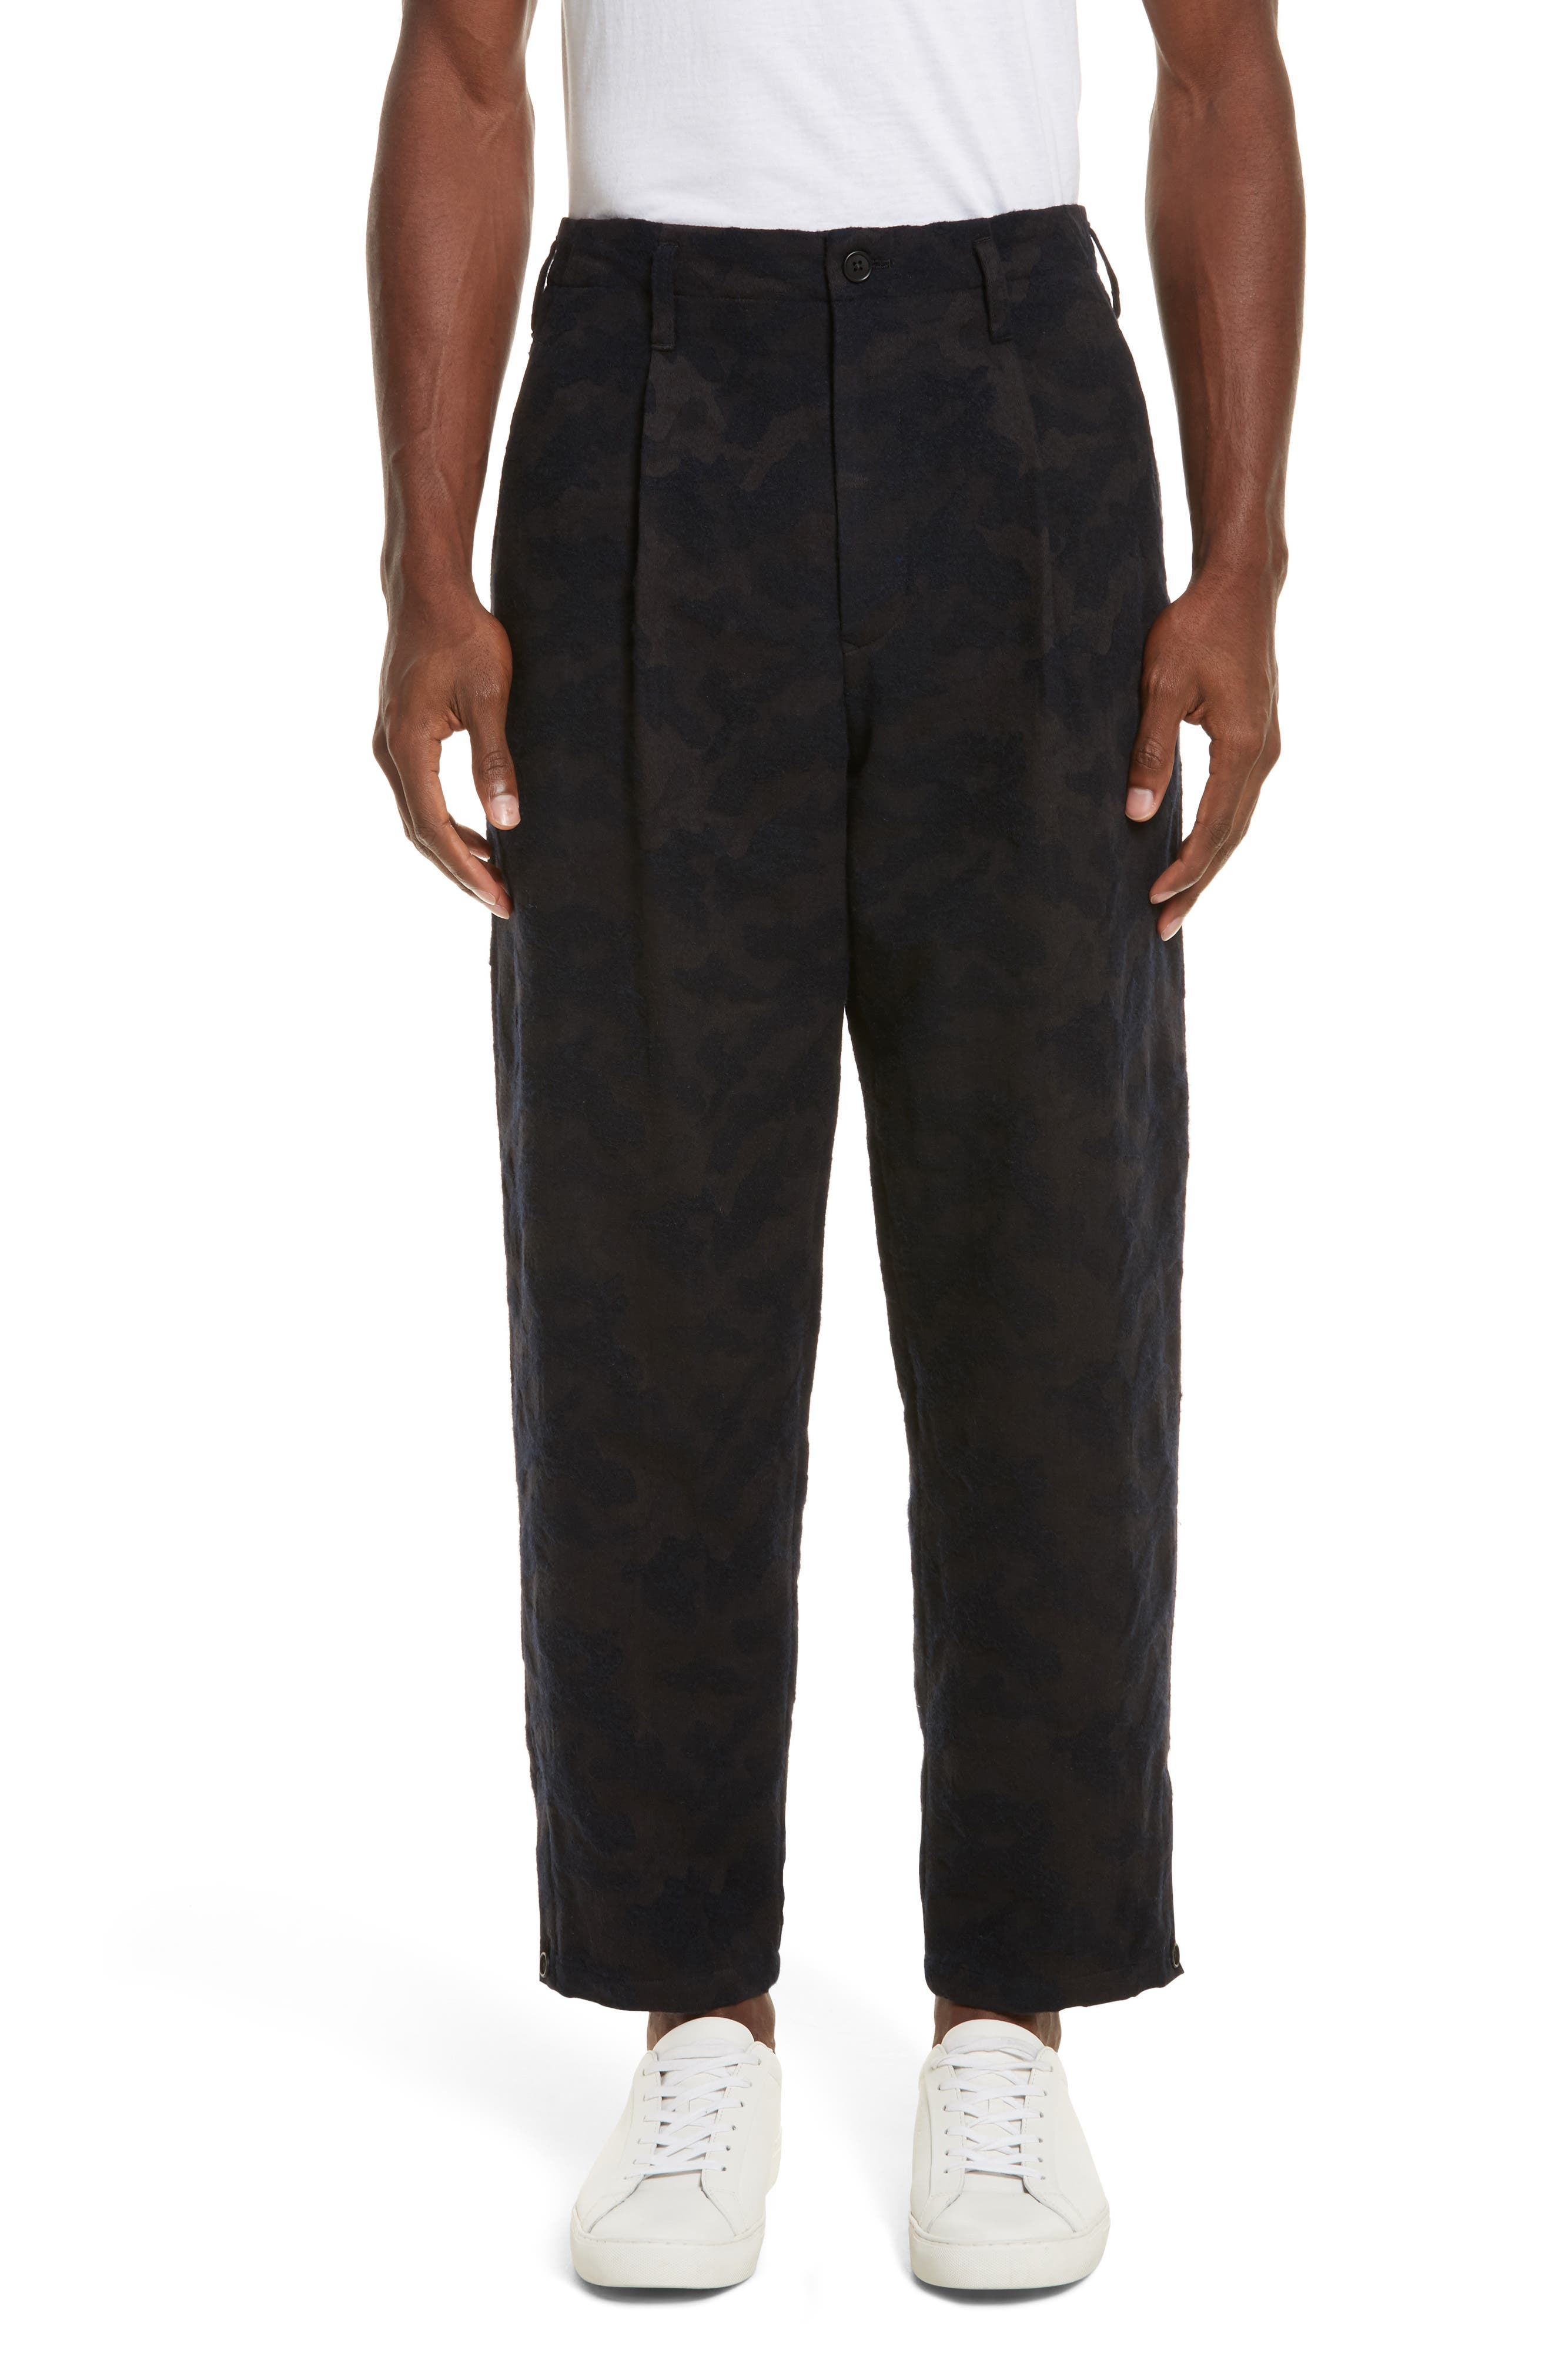 Yohji Yamamoto Camo Crop Pants